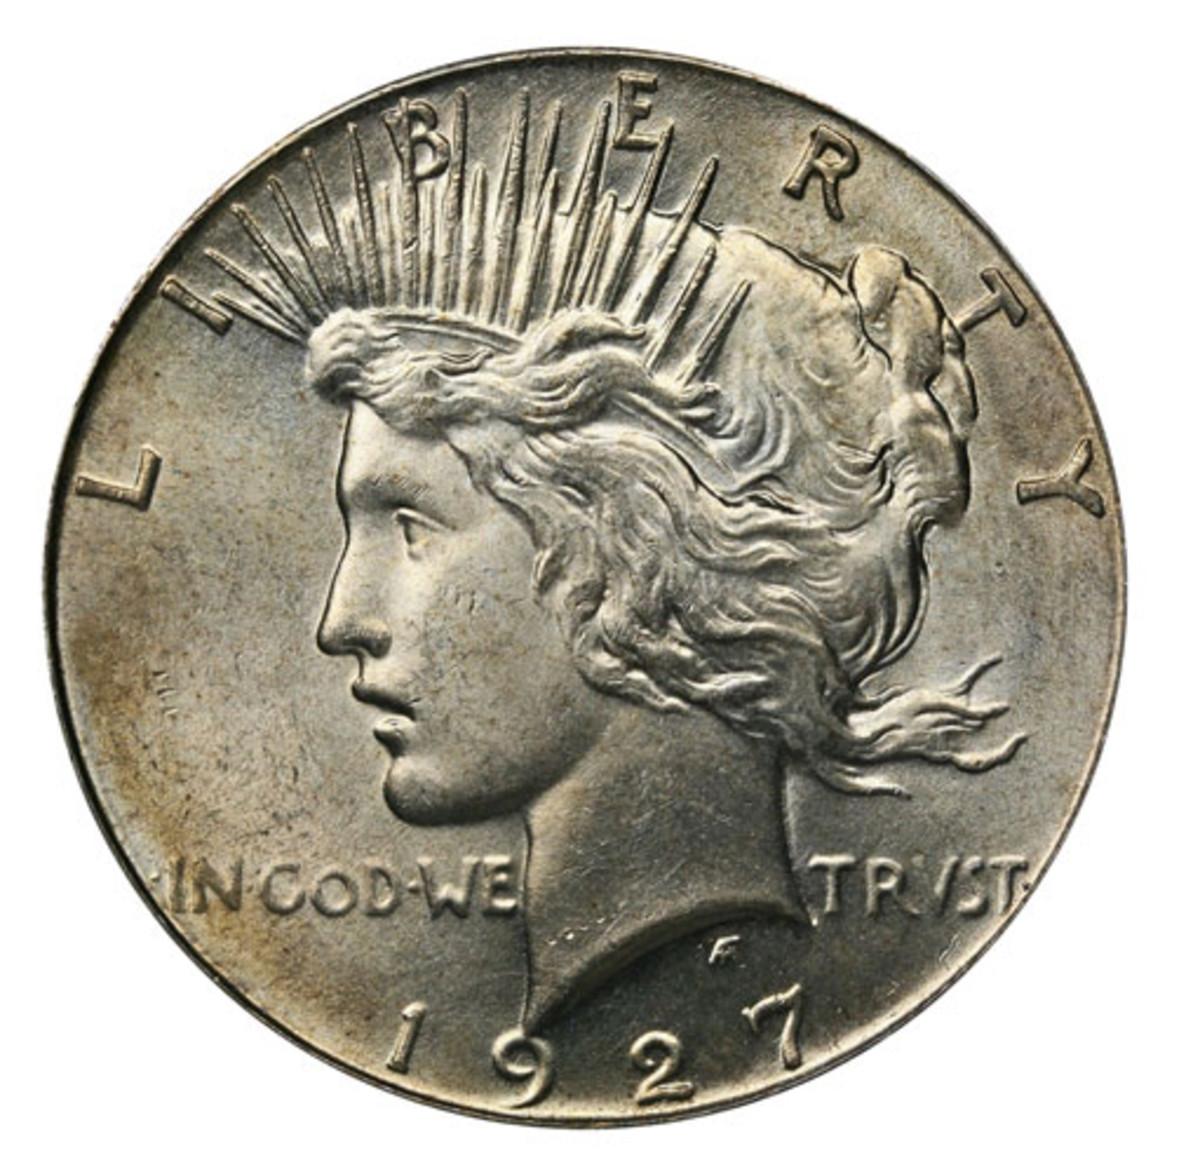 A 1927 Peace dollar. (Image courtesy USA Coinbook)